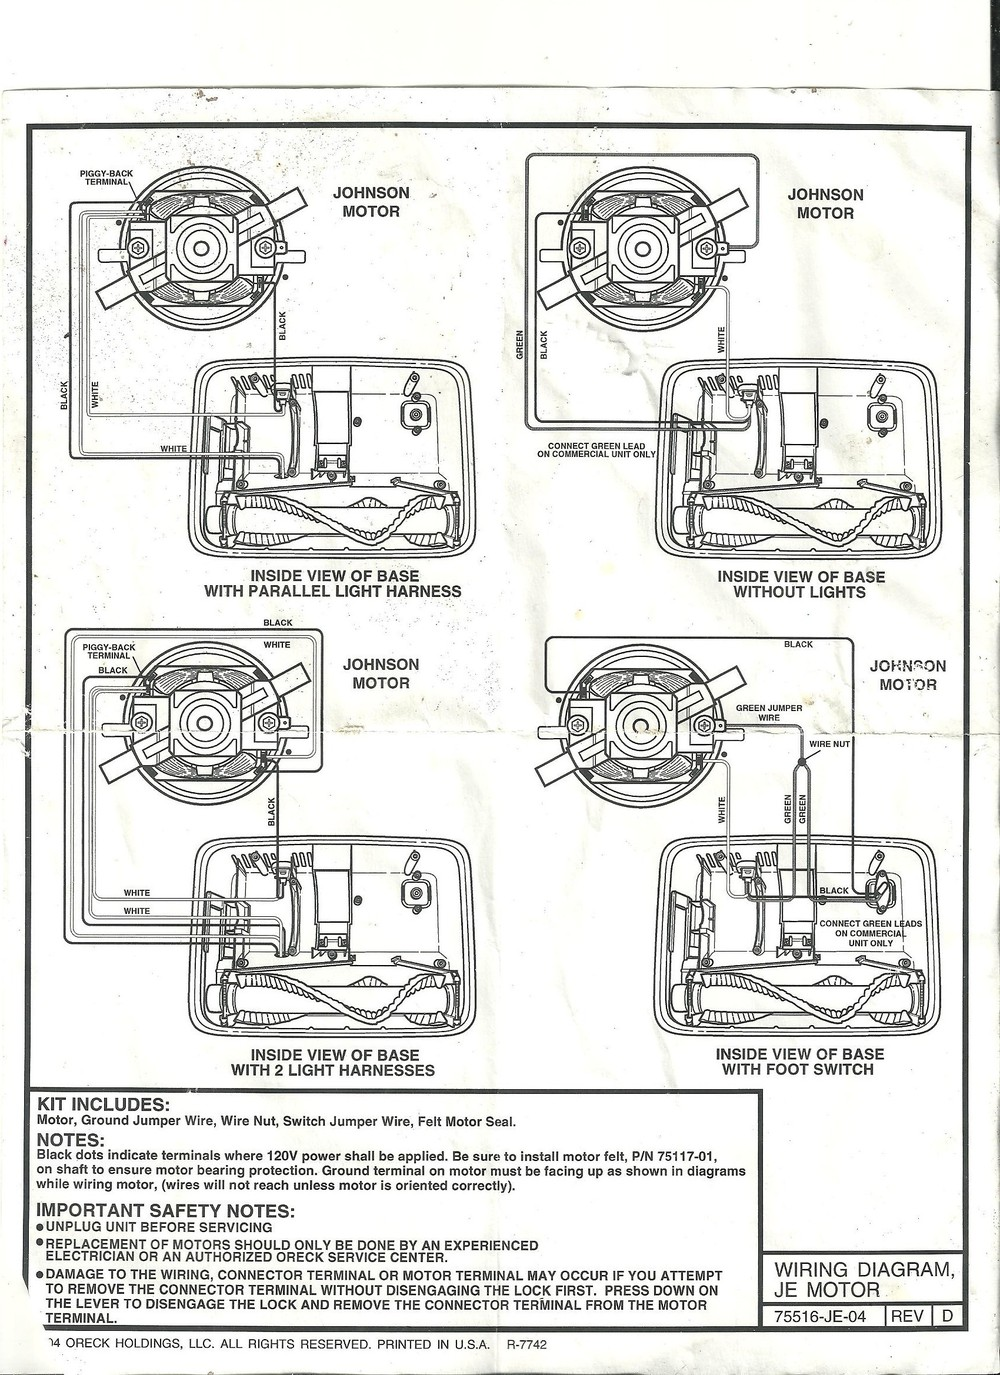 Amazing Oreck Motor Wiring Diagram Wiring Diagram Database Wiring 101 Akebretraxxcnl